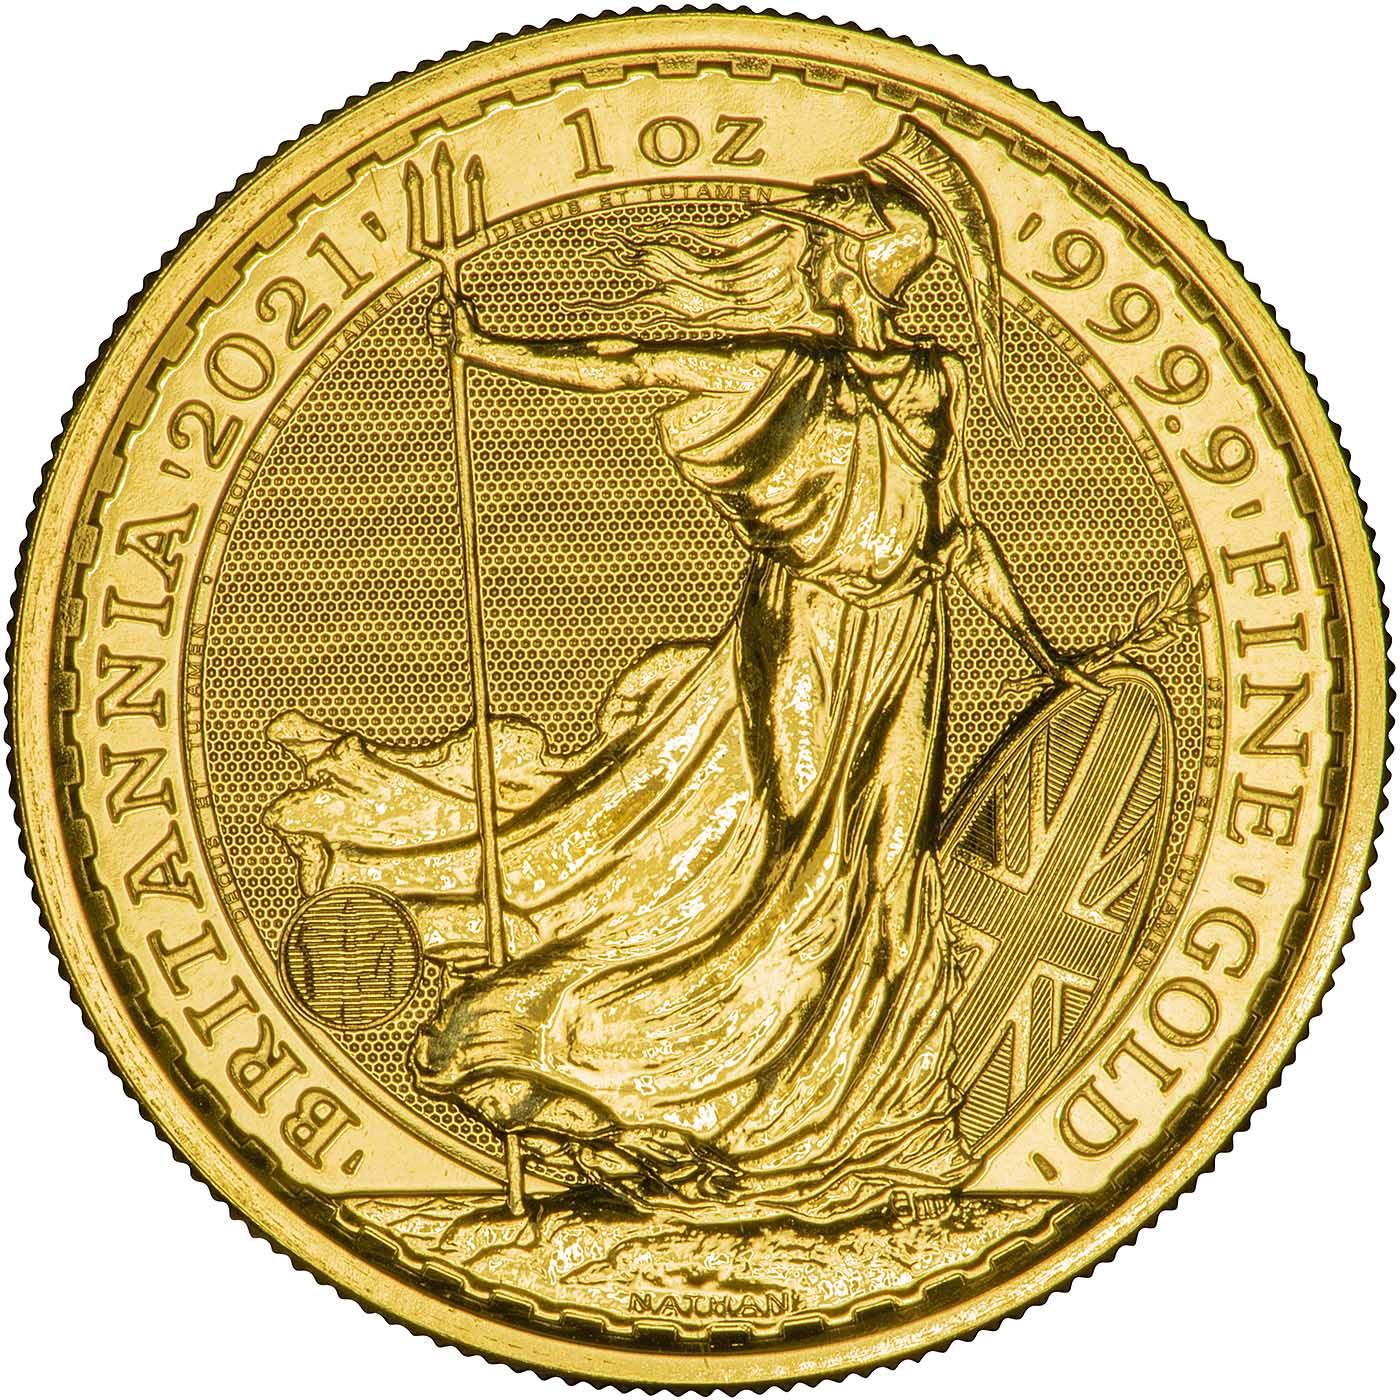 2021-britannia-1-oz-gold-bullion-coin-reverse-500